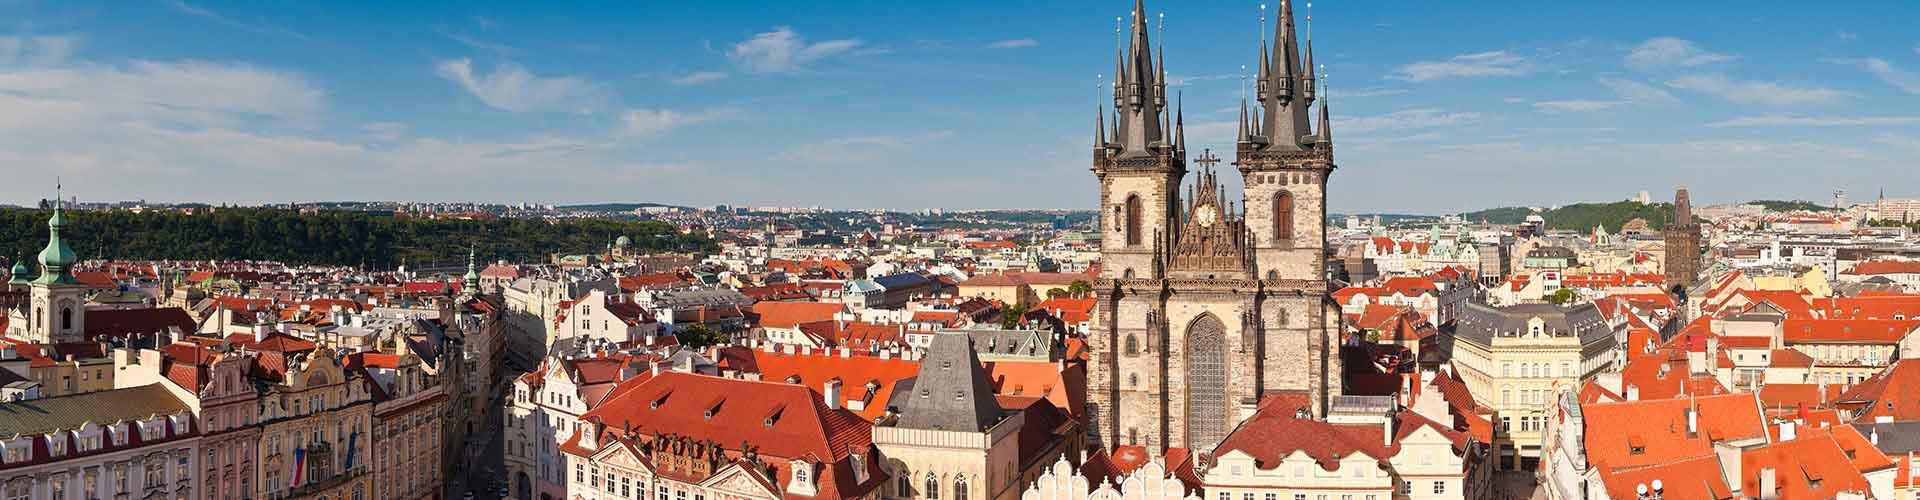 Praga - Albergues cerca a Iglesia de Tyn. Mapas de Praga, Fotos y Comentarios para cada Albergue en Praga.